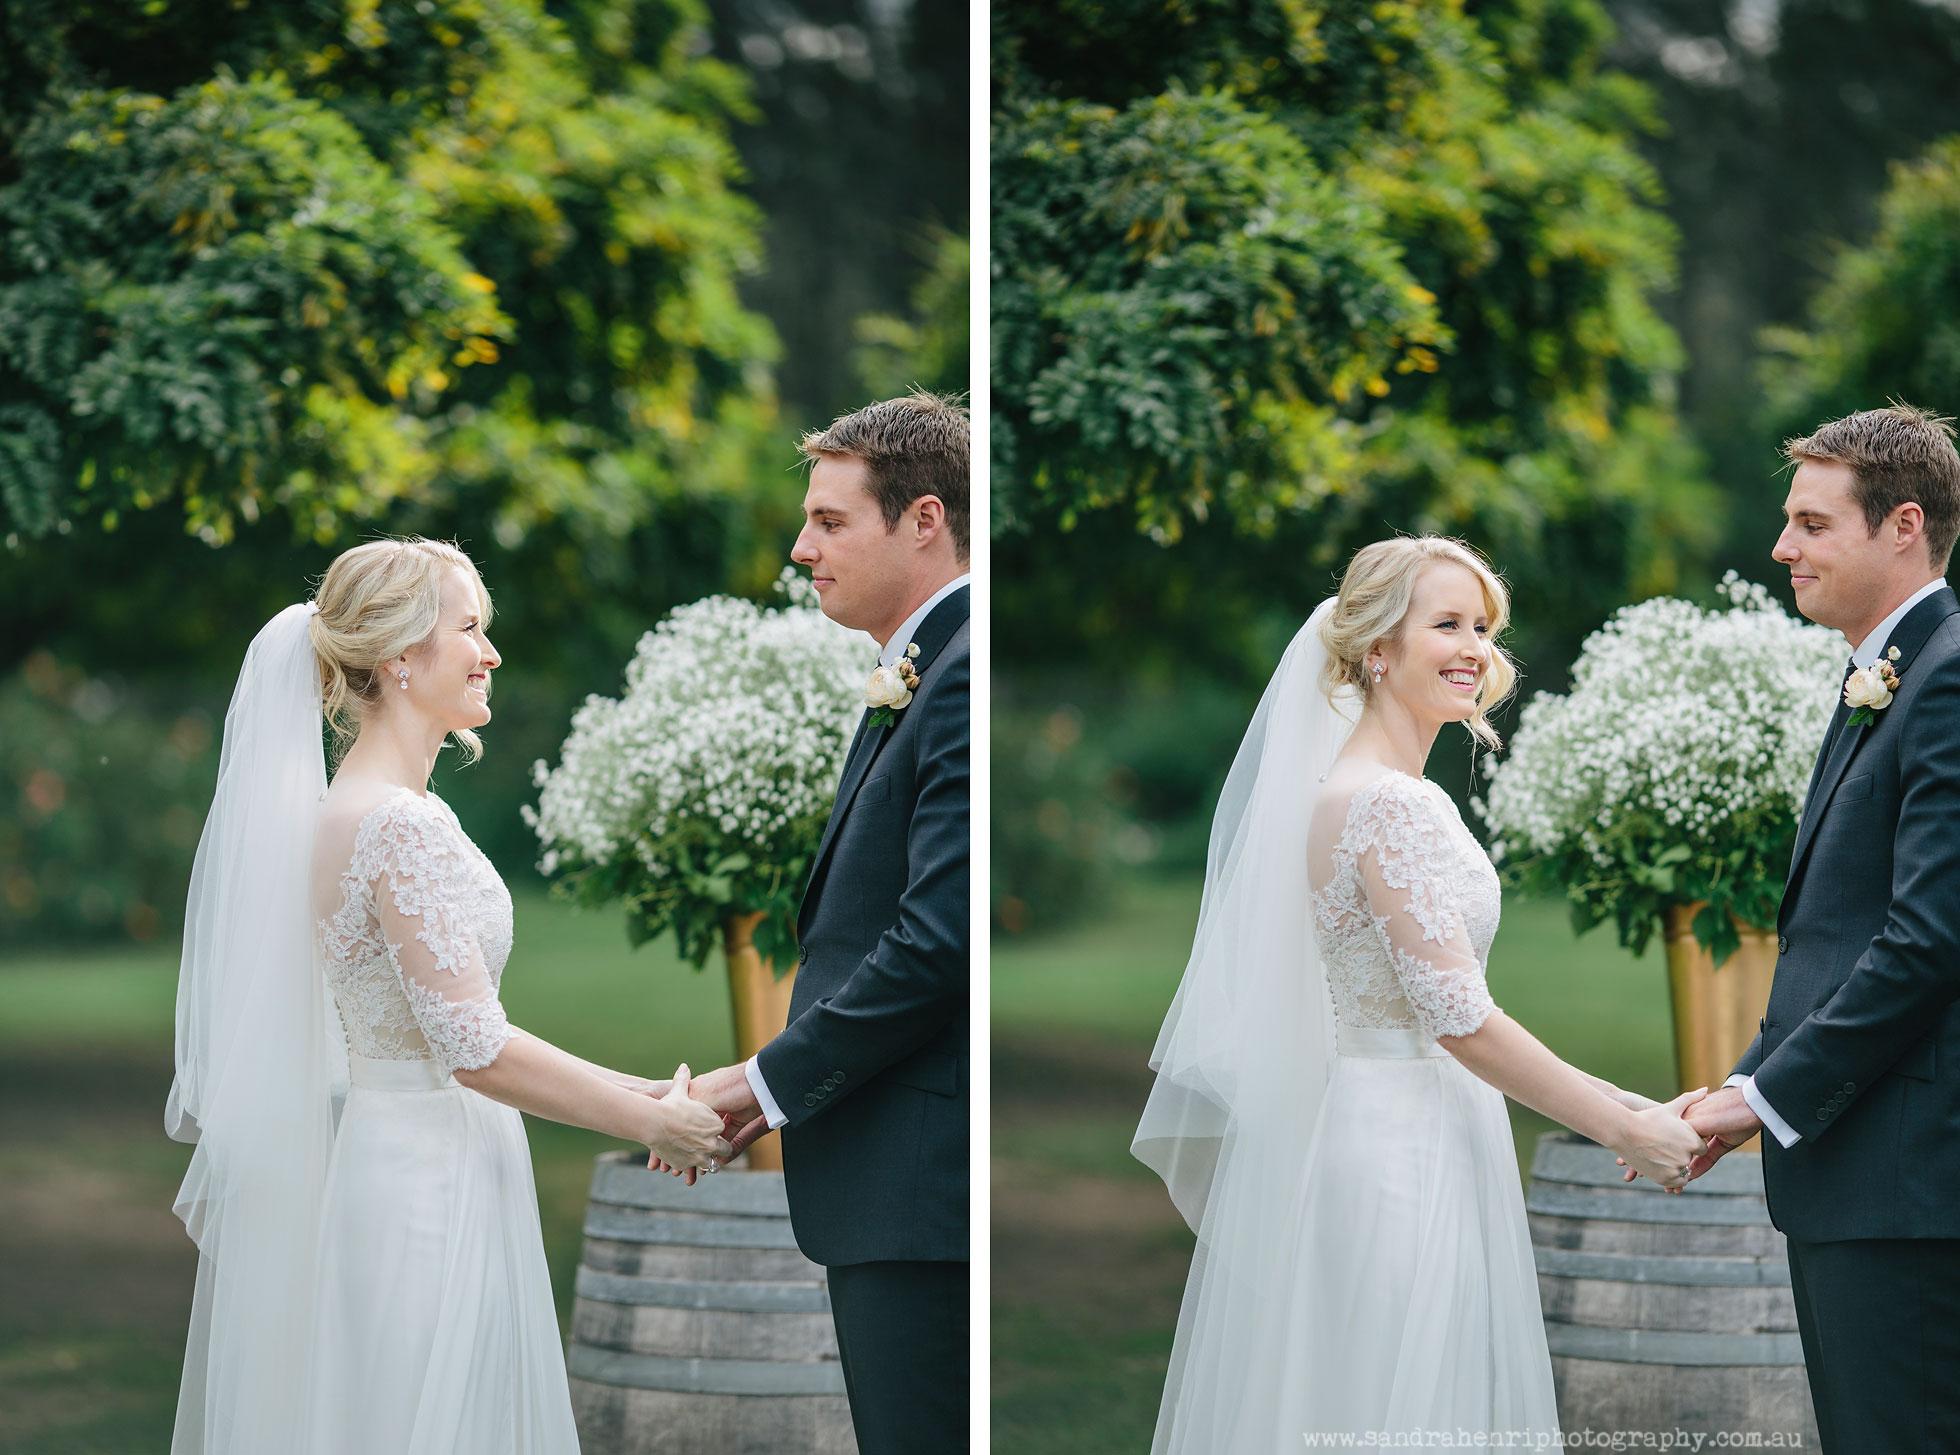 Roberts-Restaurant-garden-wedding-images-17.jpg